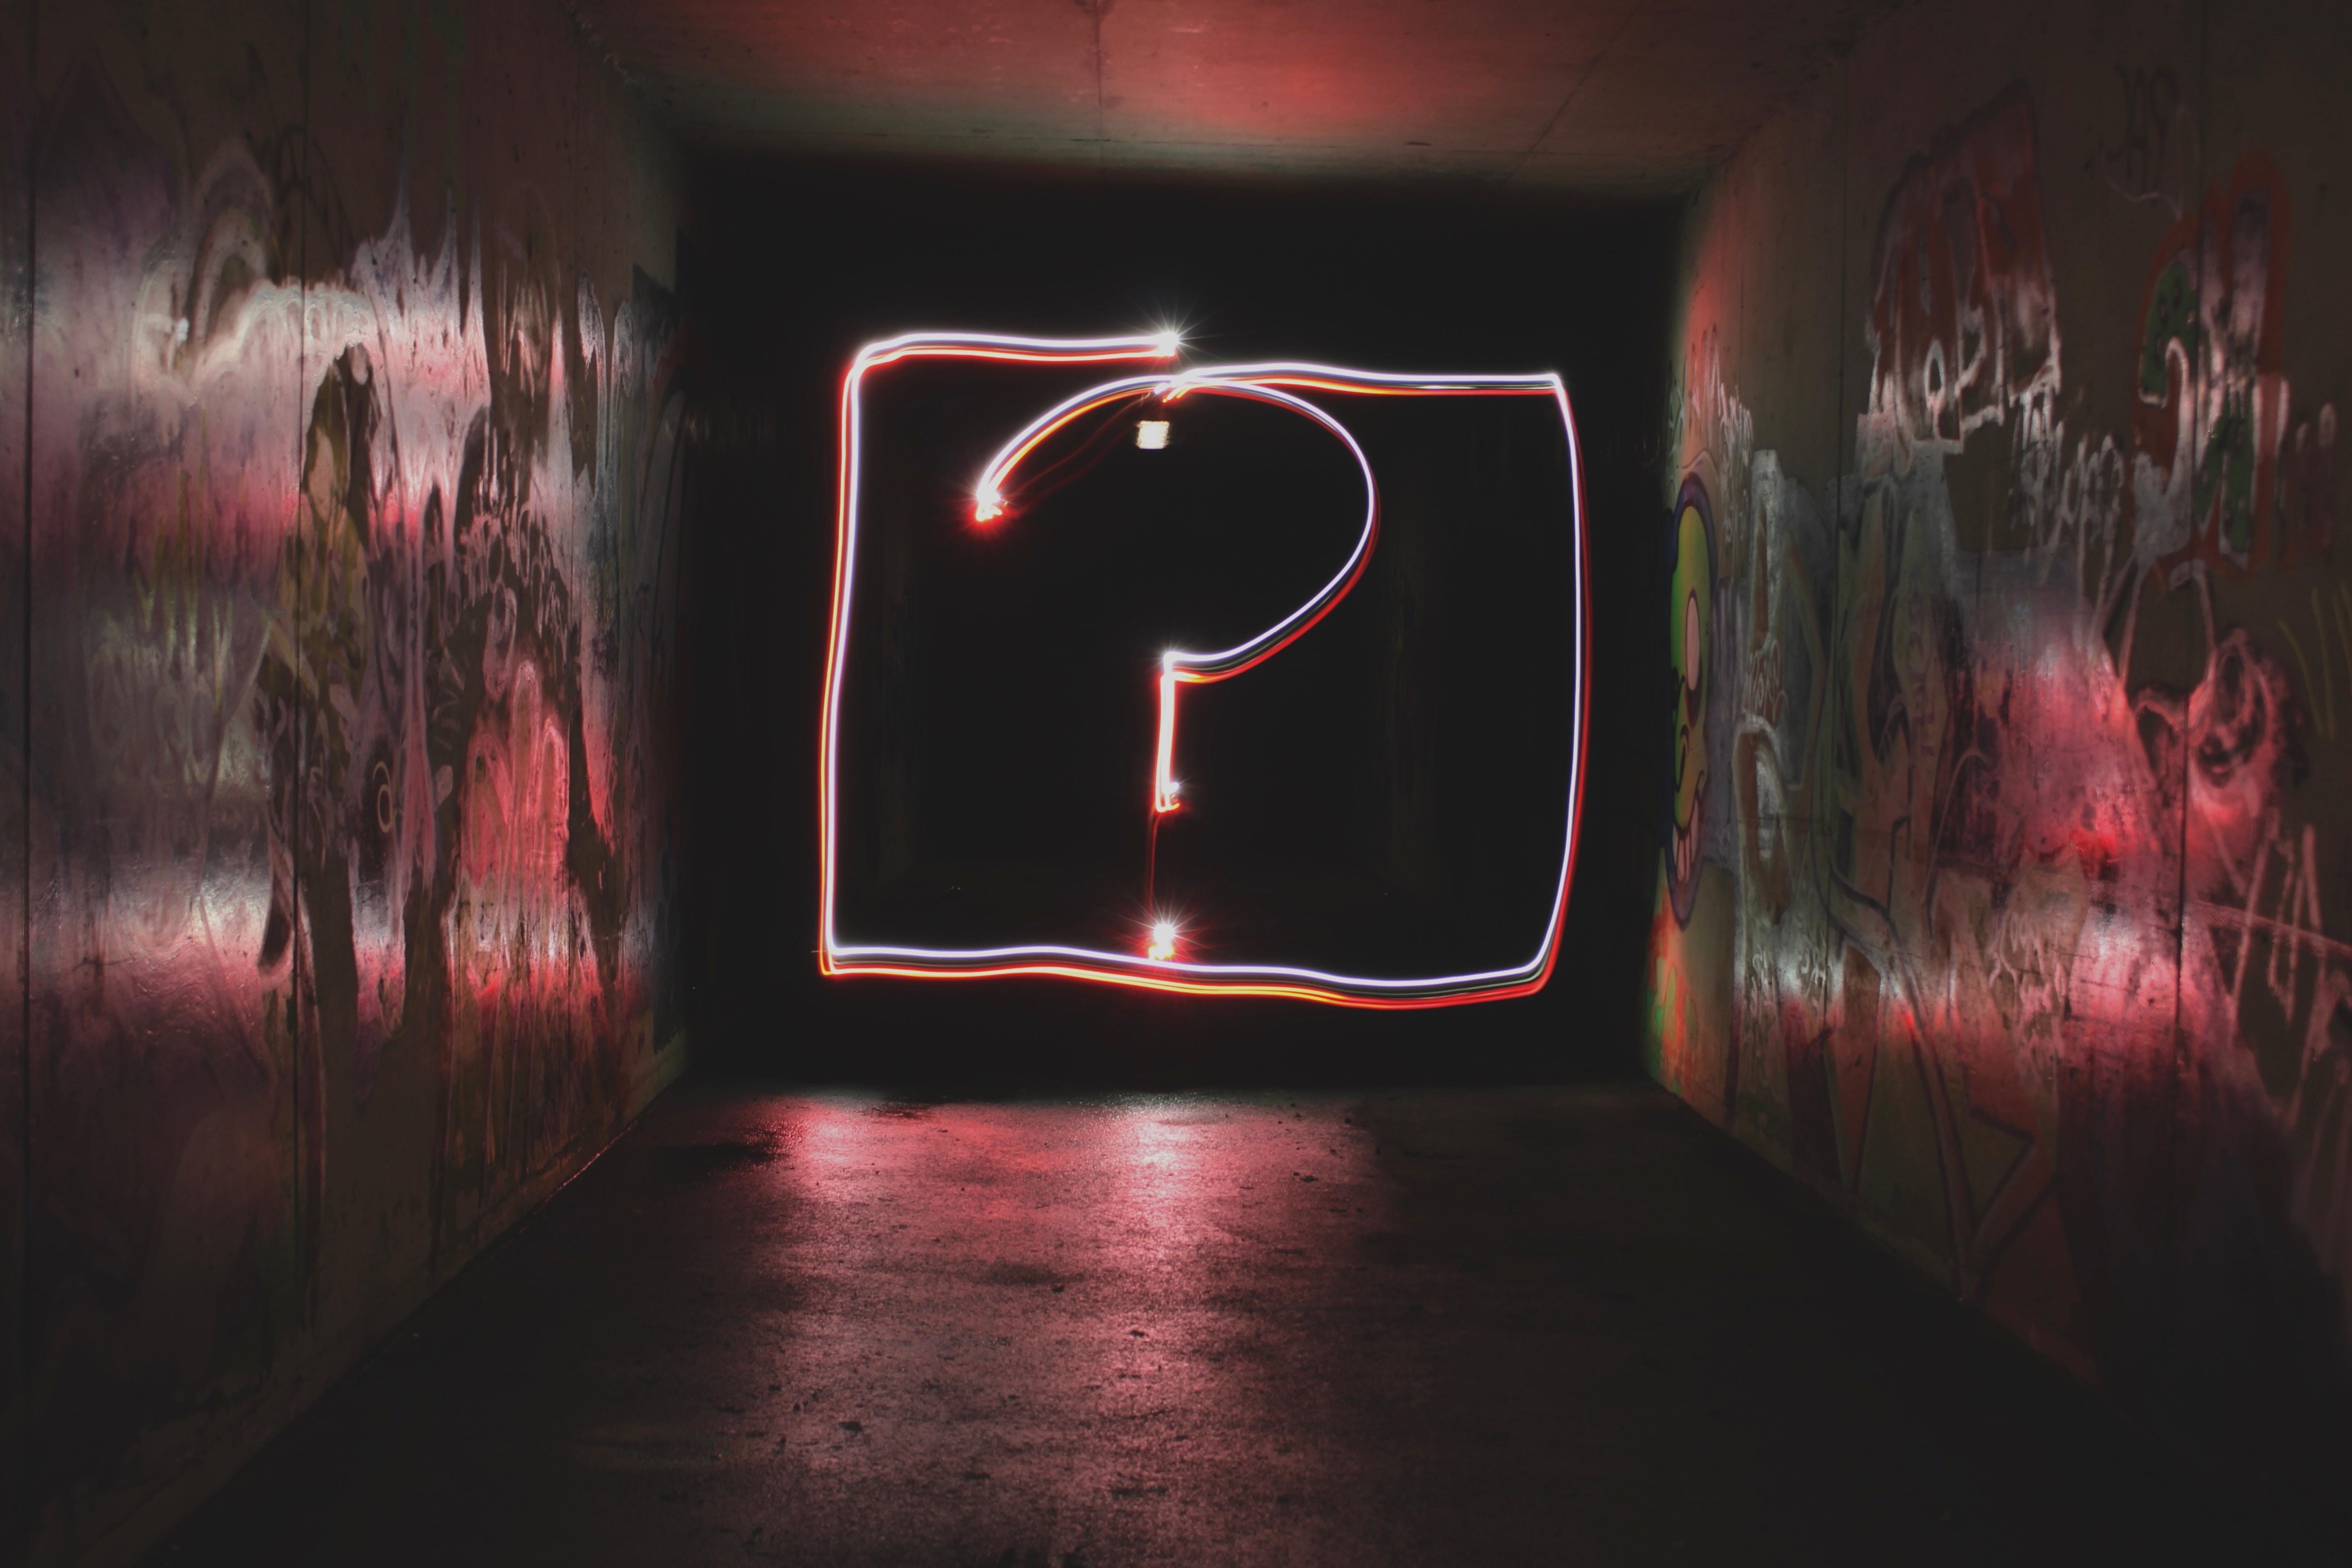 A bright question mark in a dark room